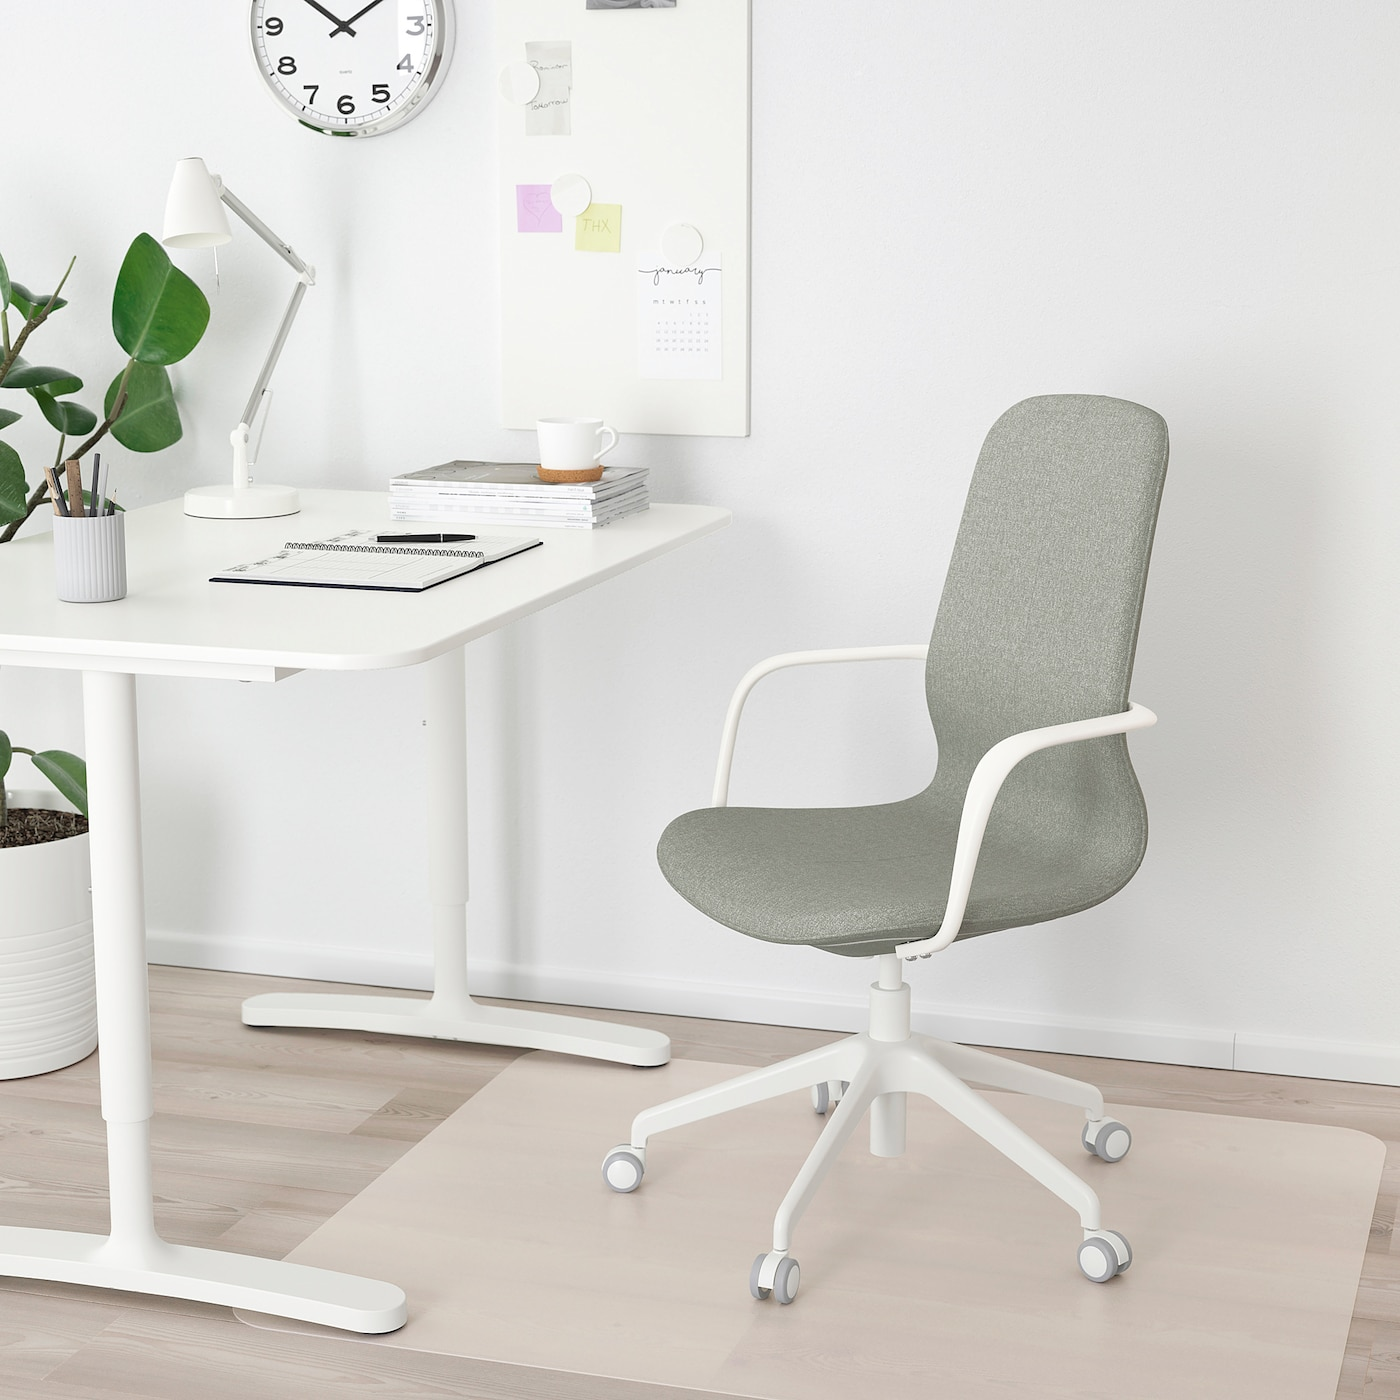 LÅNGFJÄLL Office chair with armrests Gunnared light green, white